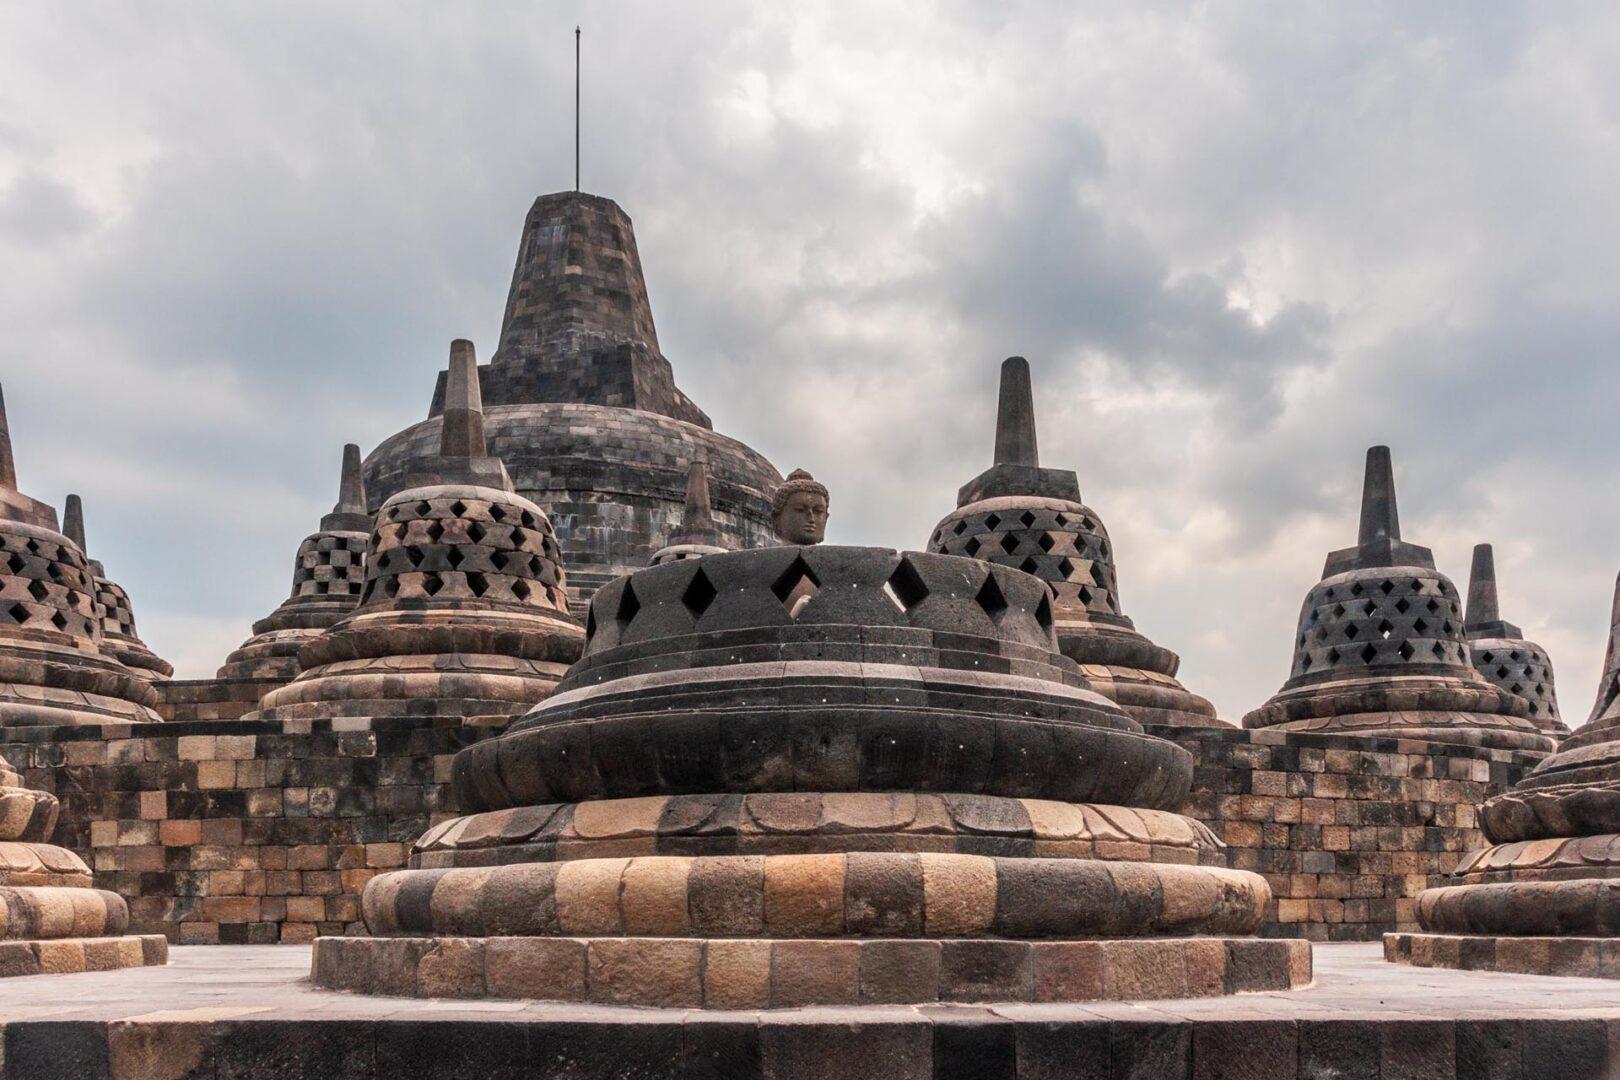 Stupa's met de buddha beelden in de stupa's bovenop de Borobudur vlak bij Yogyakarta